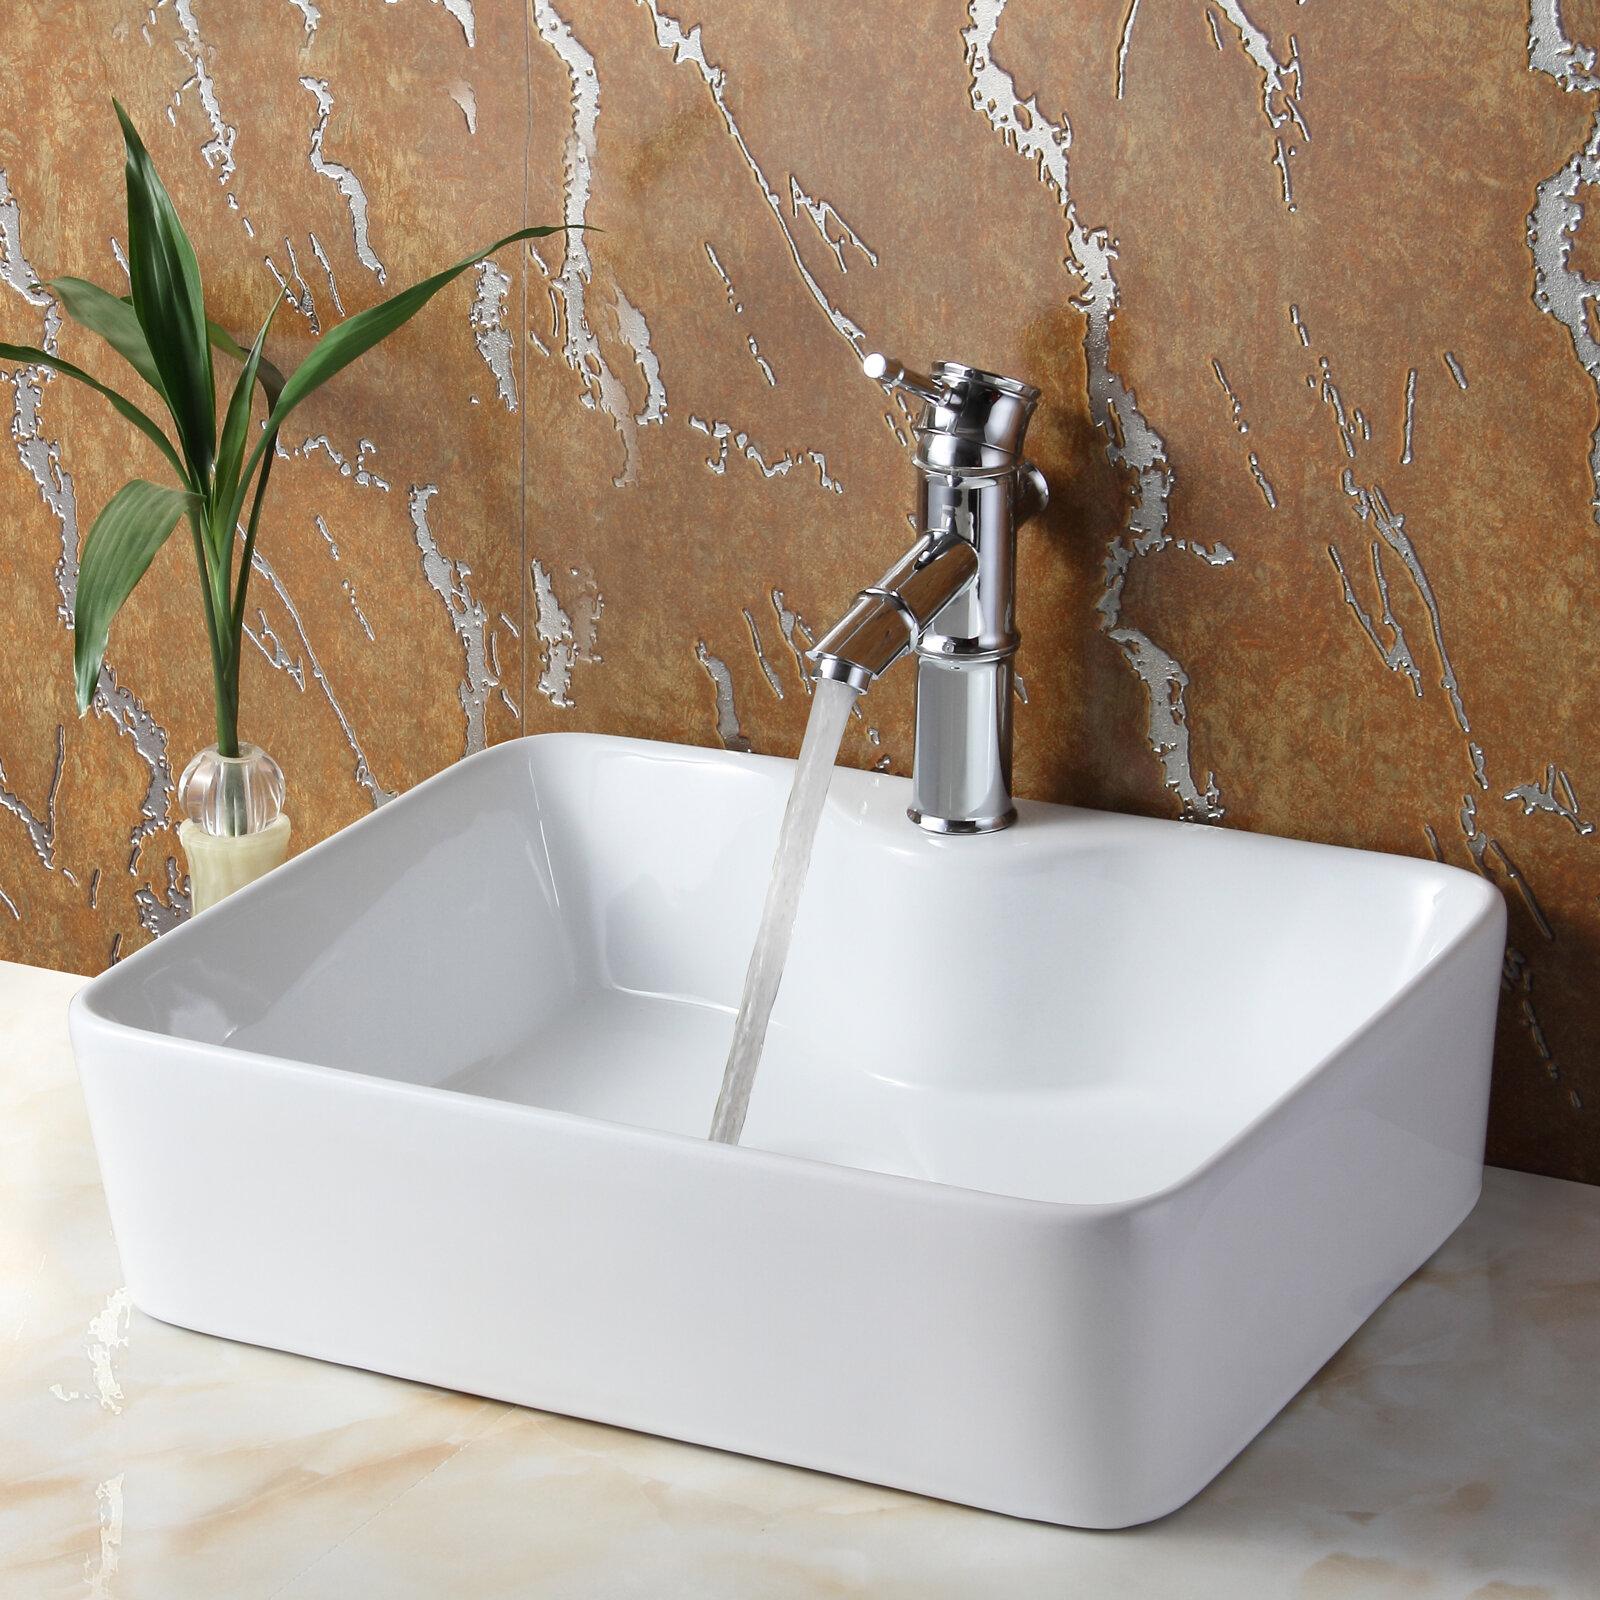 Elite Ceramic Rectangular Vessel Bathroom Sink & Reviews   Wayfair